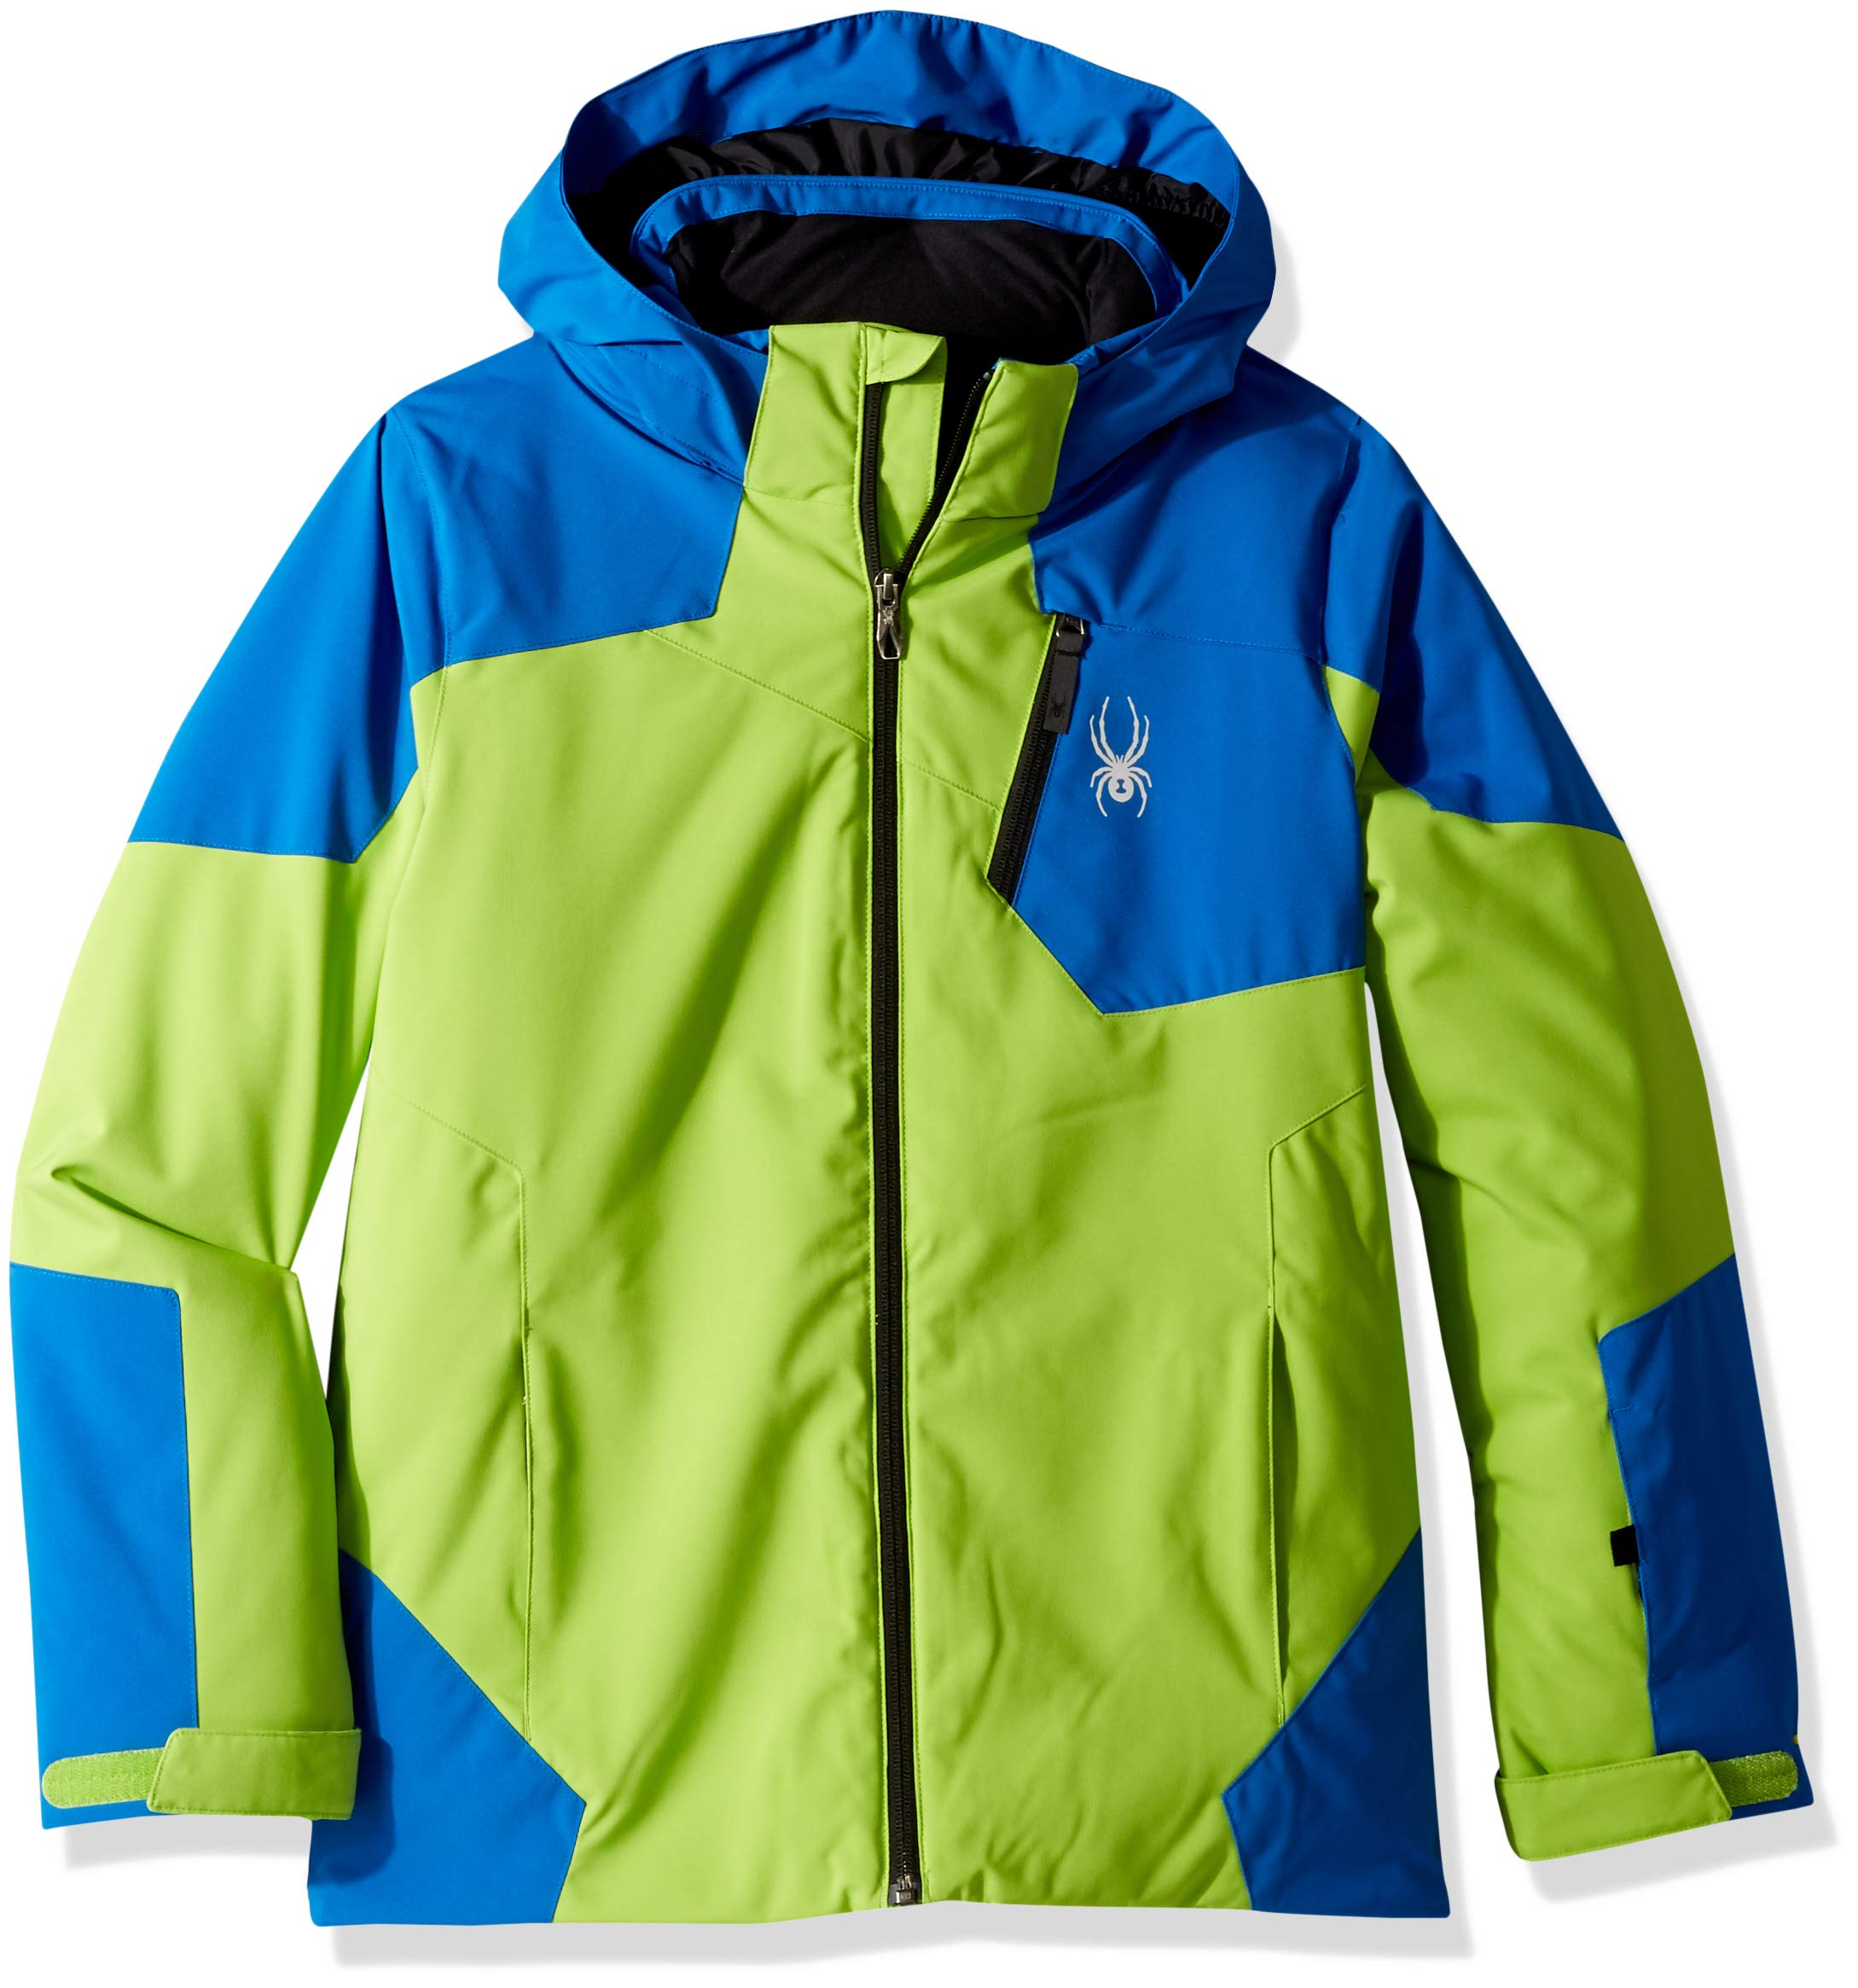 Spyder Boys' Chambers Ski Jacket, Fresh/Turkish Sea/Black, Size 8